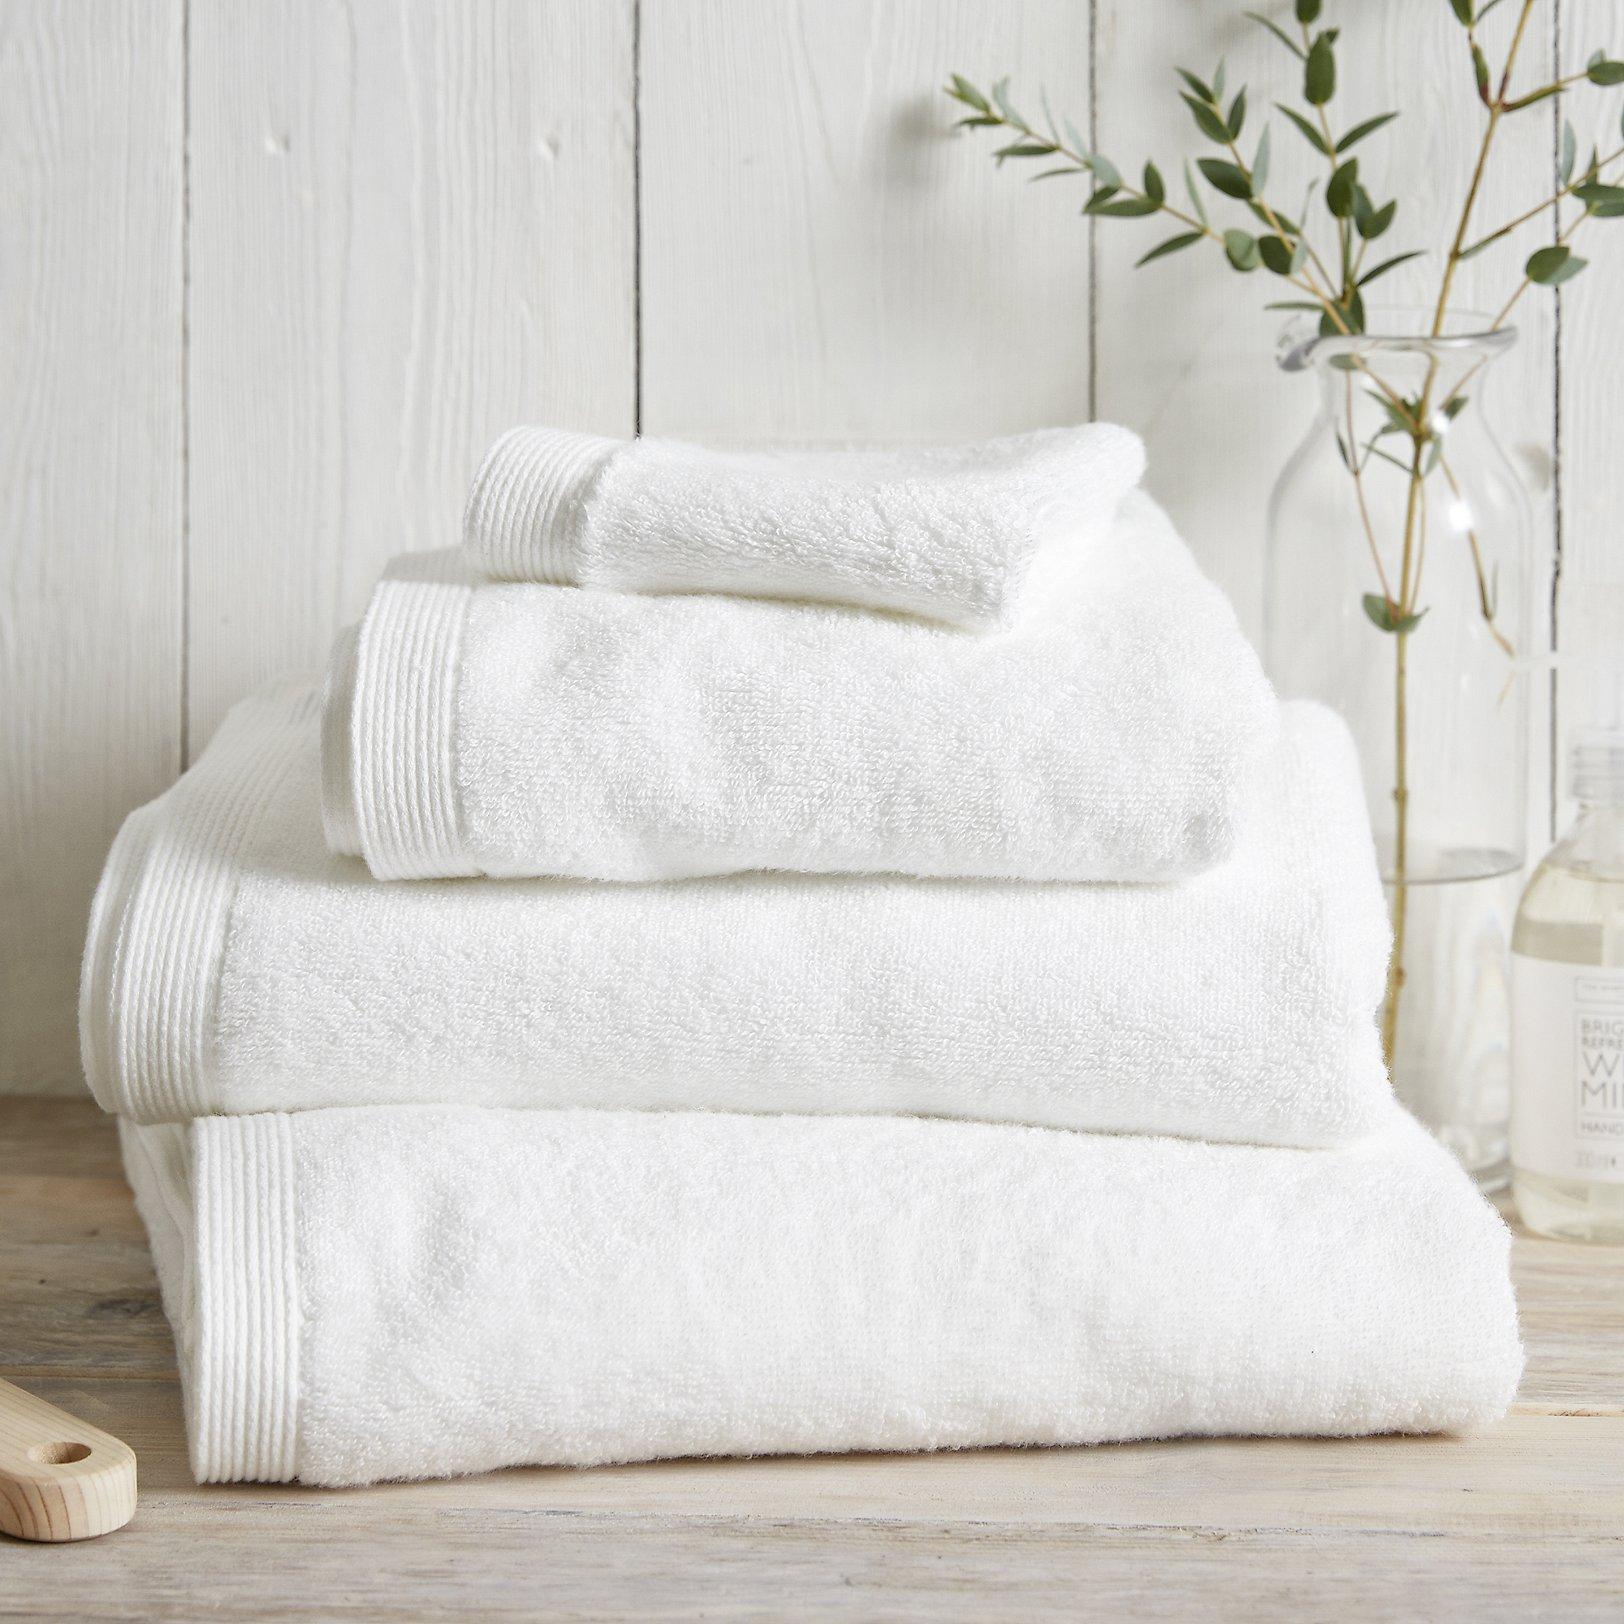 Image result for towel